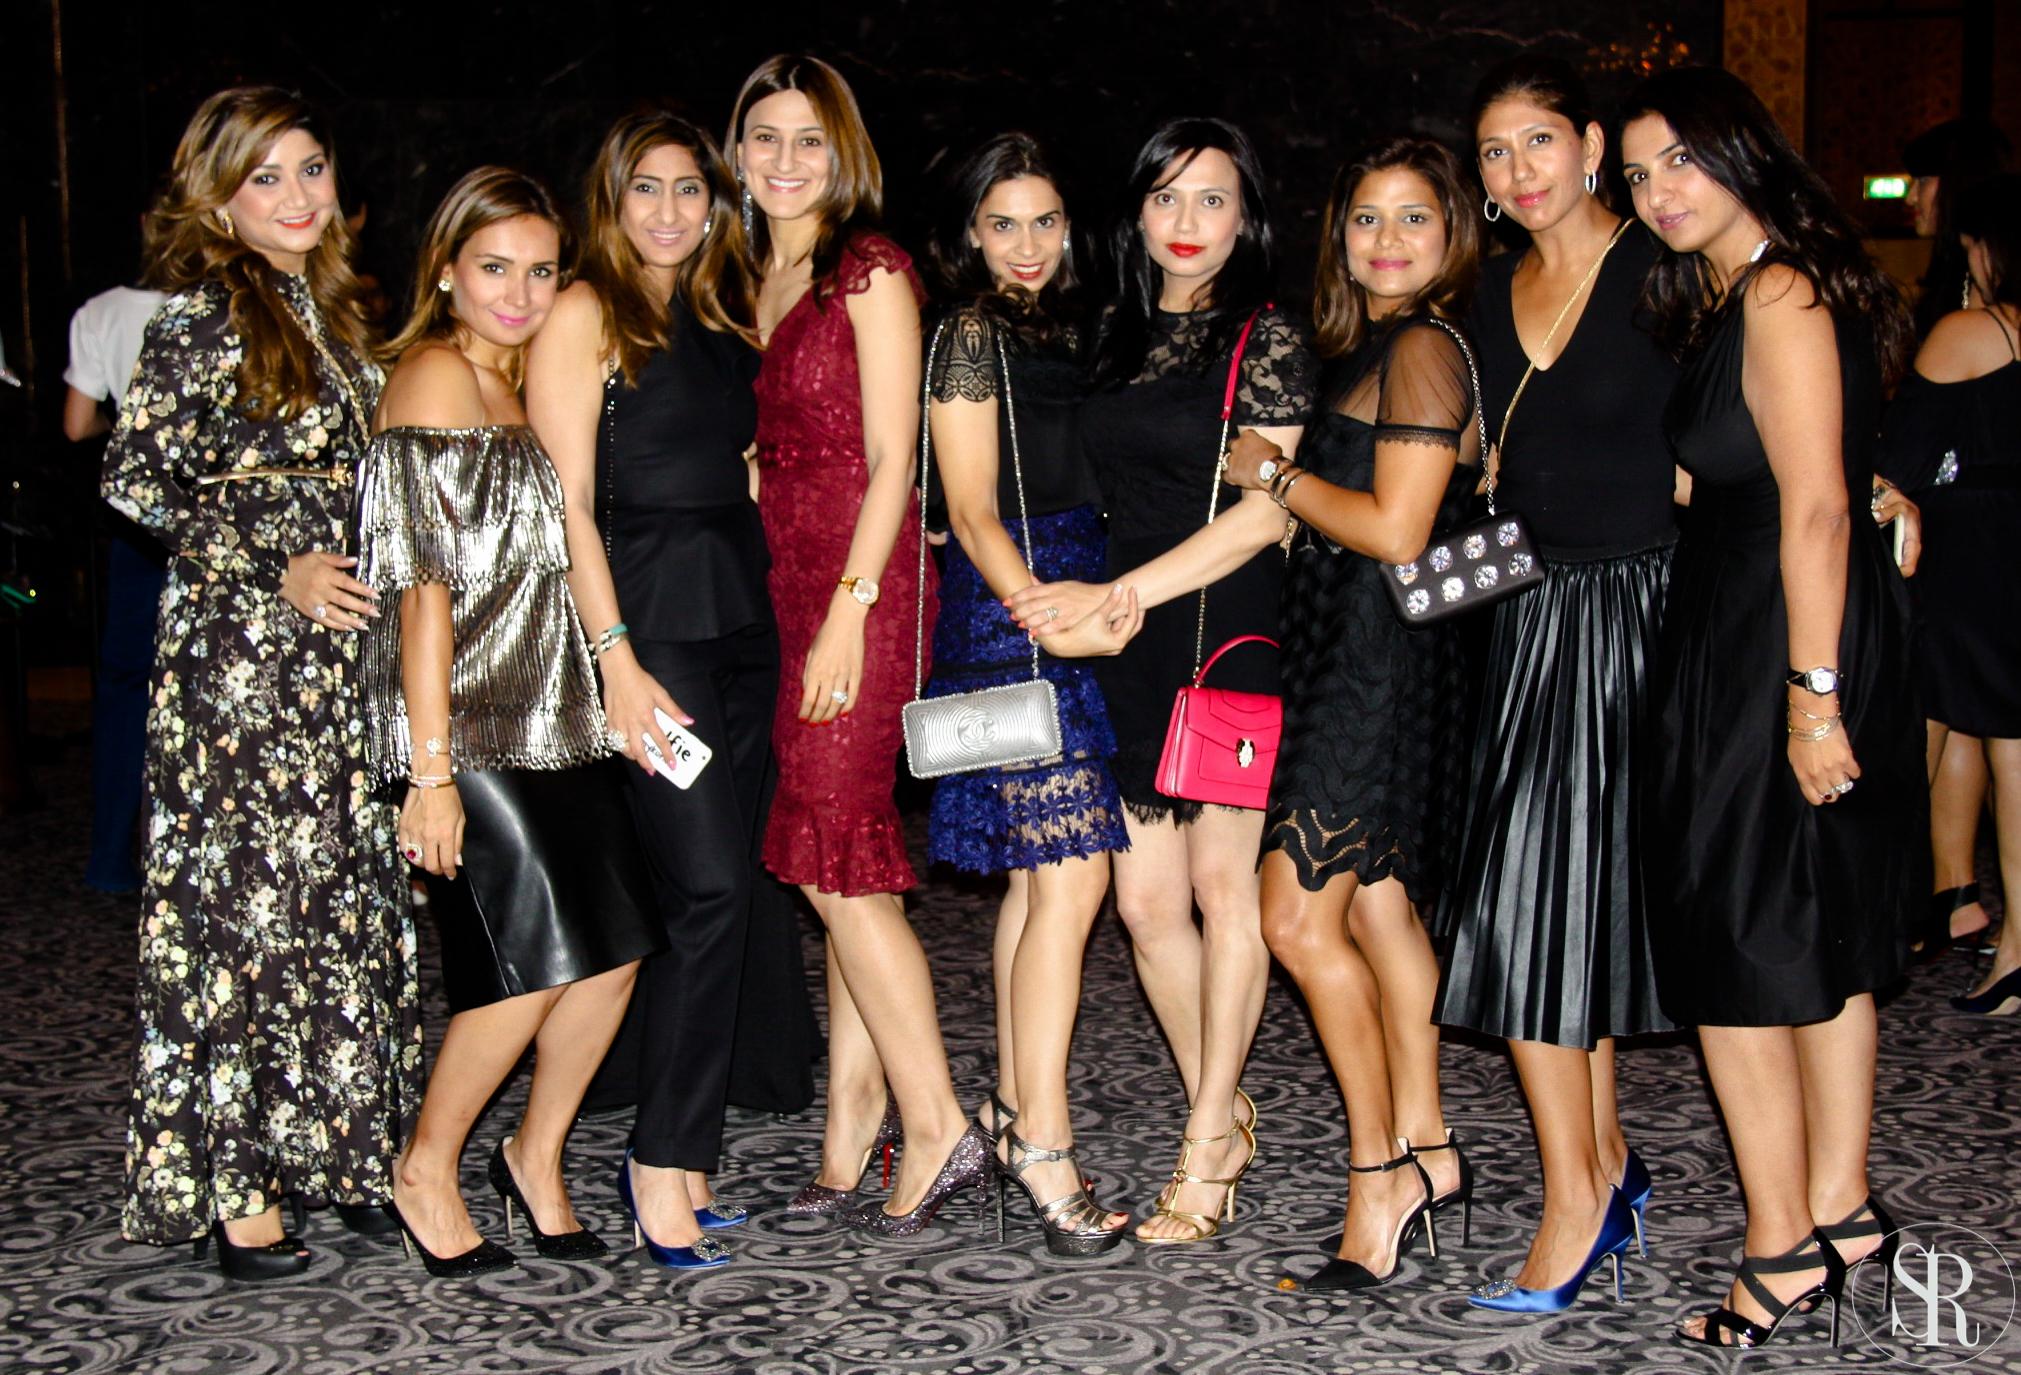 VIP launch of MANOLO BLAHNIK collection Fashion Afternoon Tea by Raffles Dubai-4229.jpg